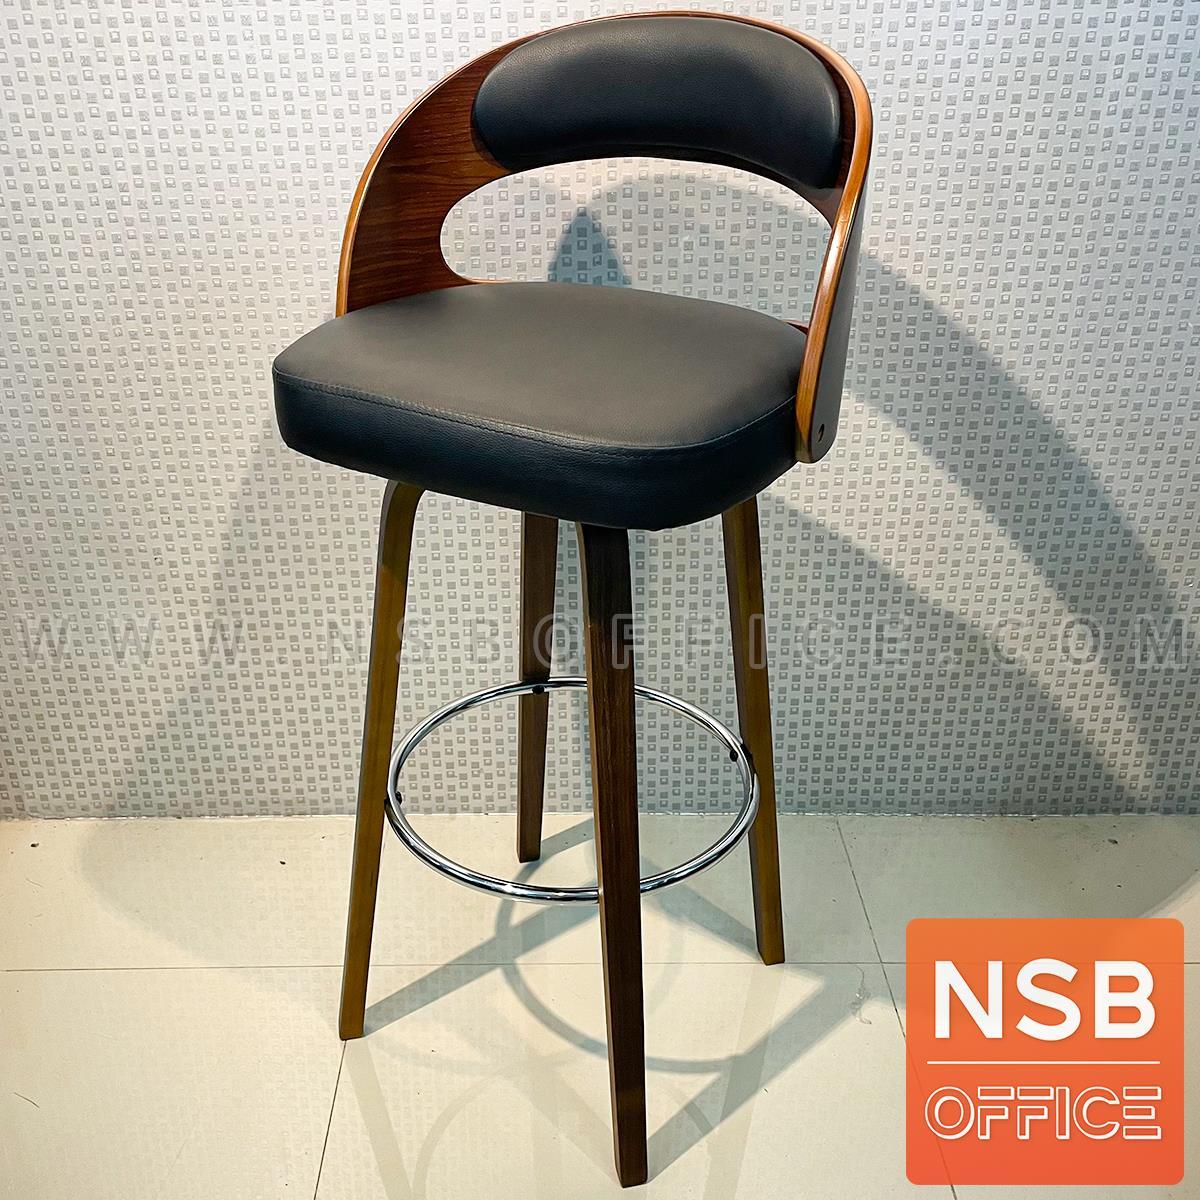 B18A095:เก้าอี้บาร์สูงหุ้มหนังเทียม รุ่น Dark knight  ขาไม้